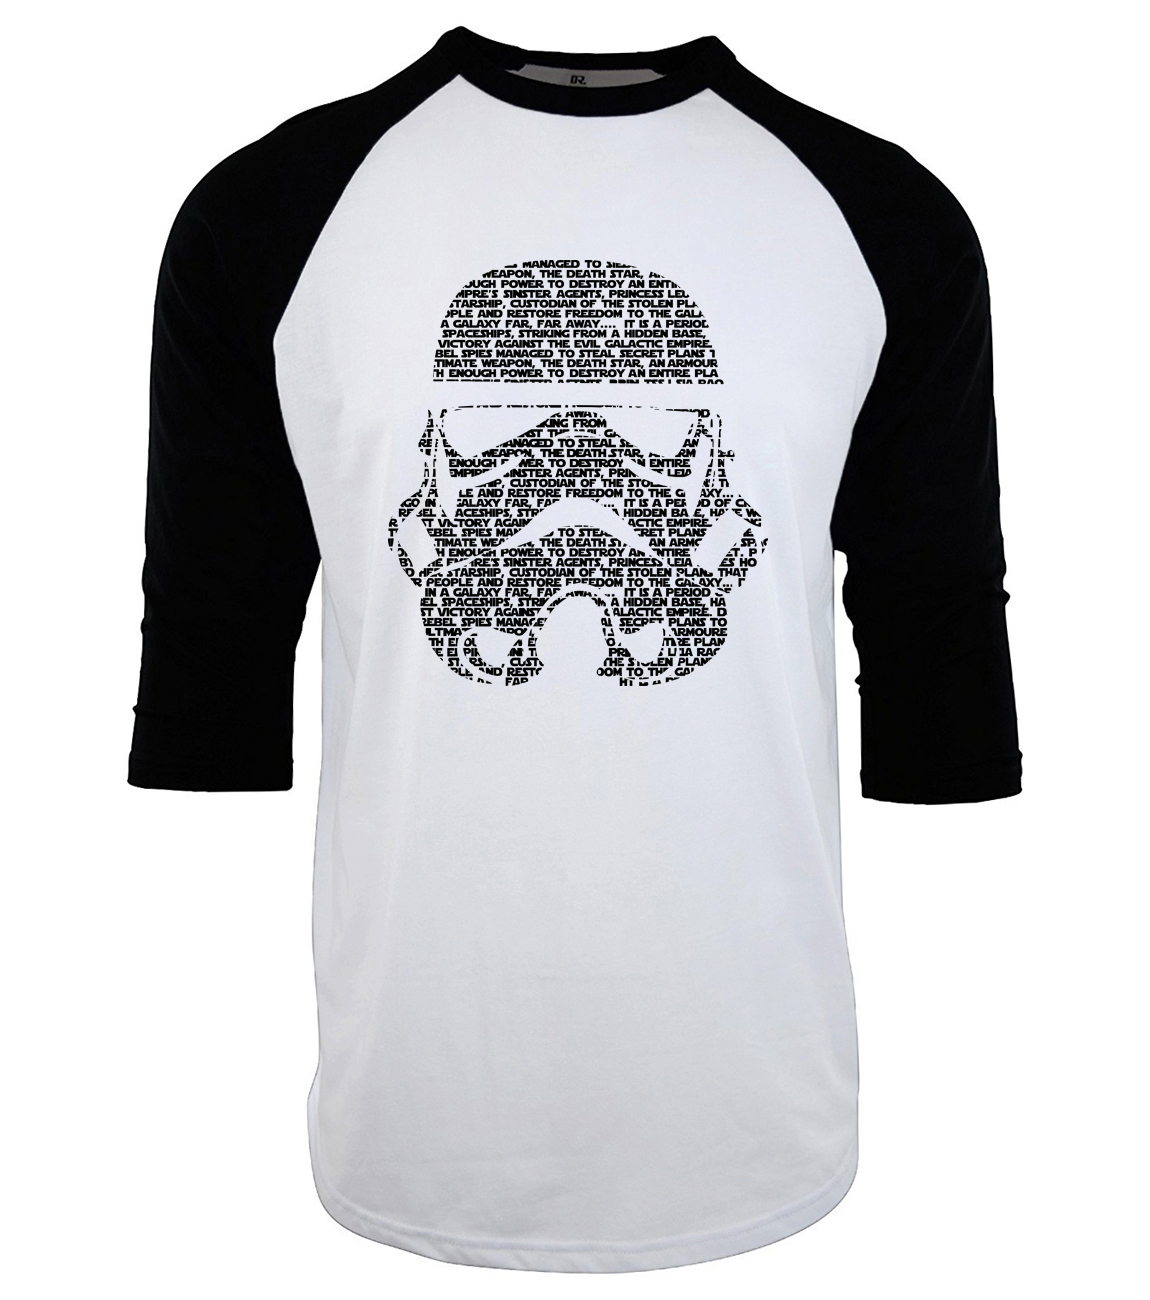 2019 fashion raglan star wars fitness camisetas mma  funny men's T-shirts Cotton punk three-quarter sleeve tee shirt homme